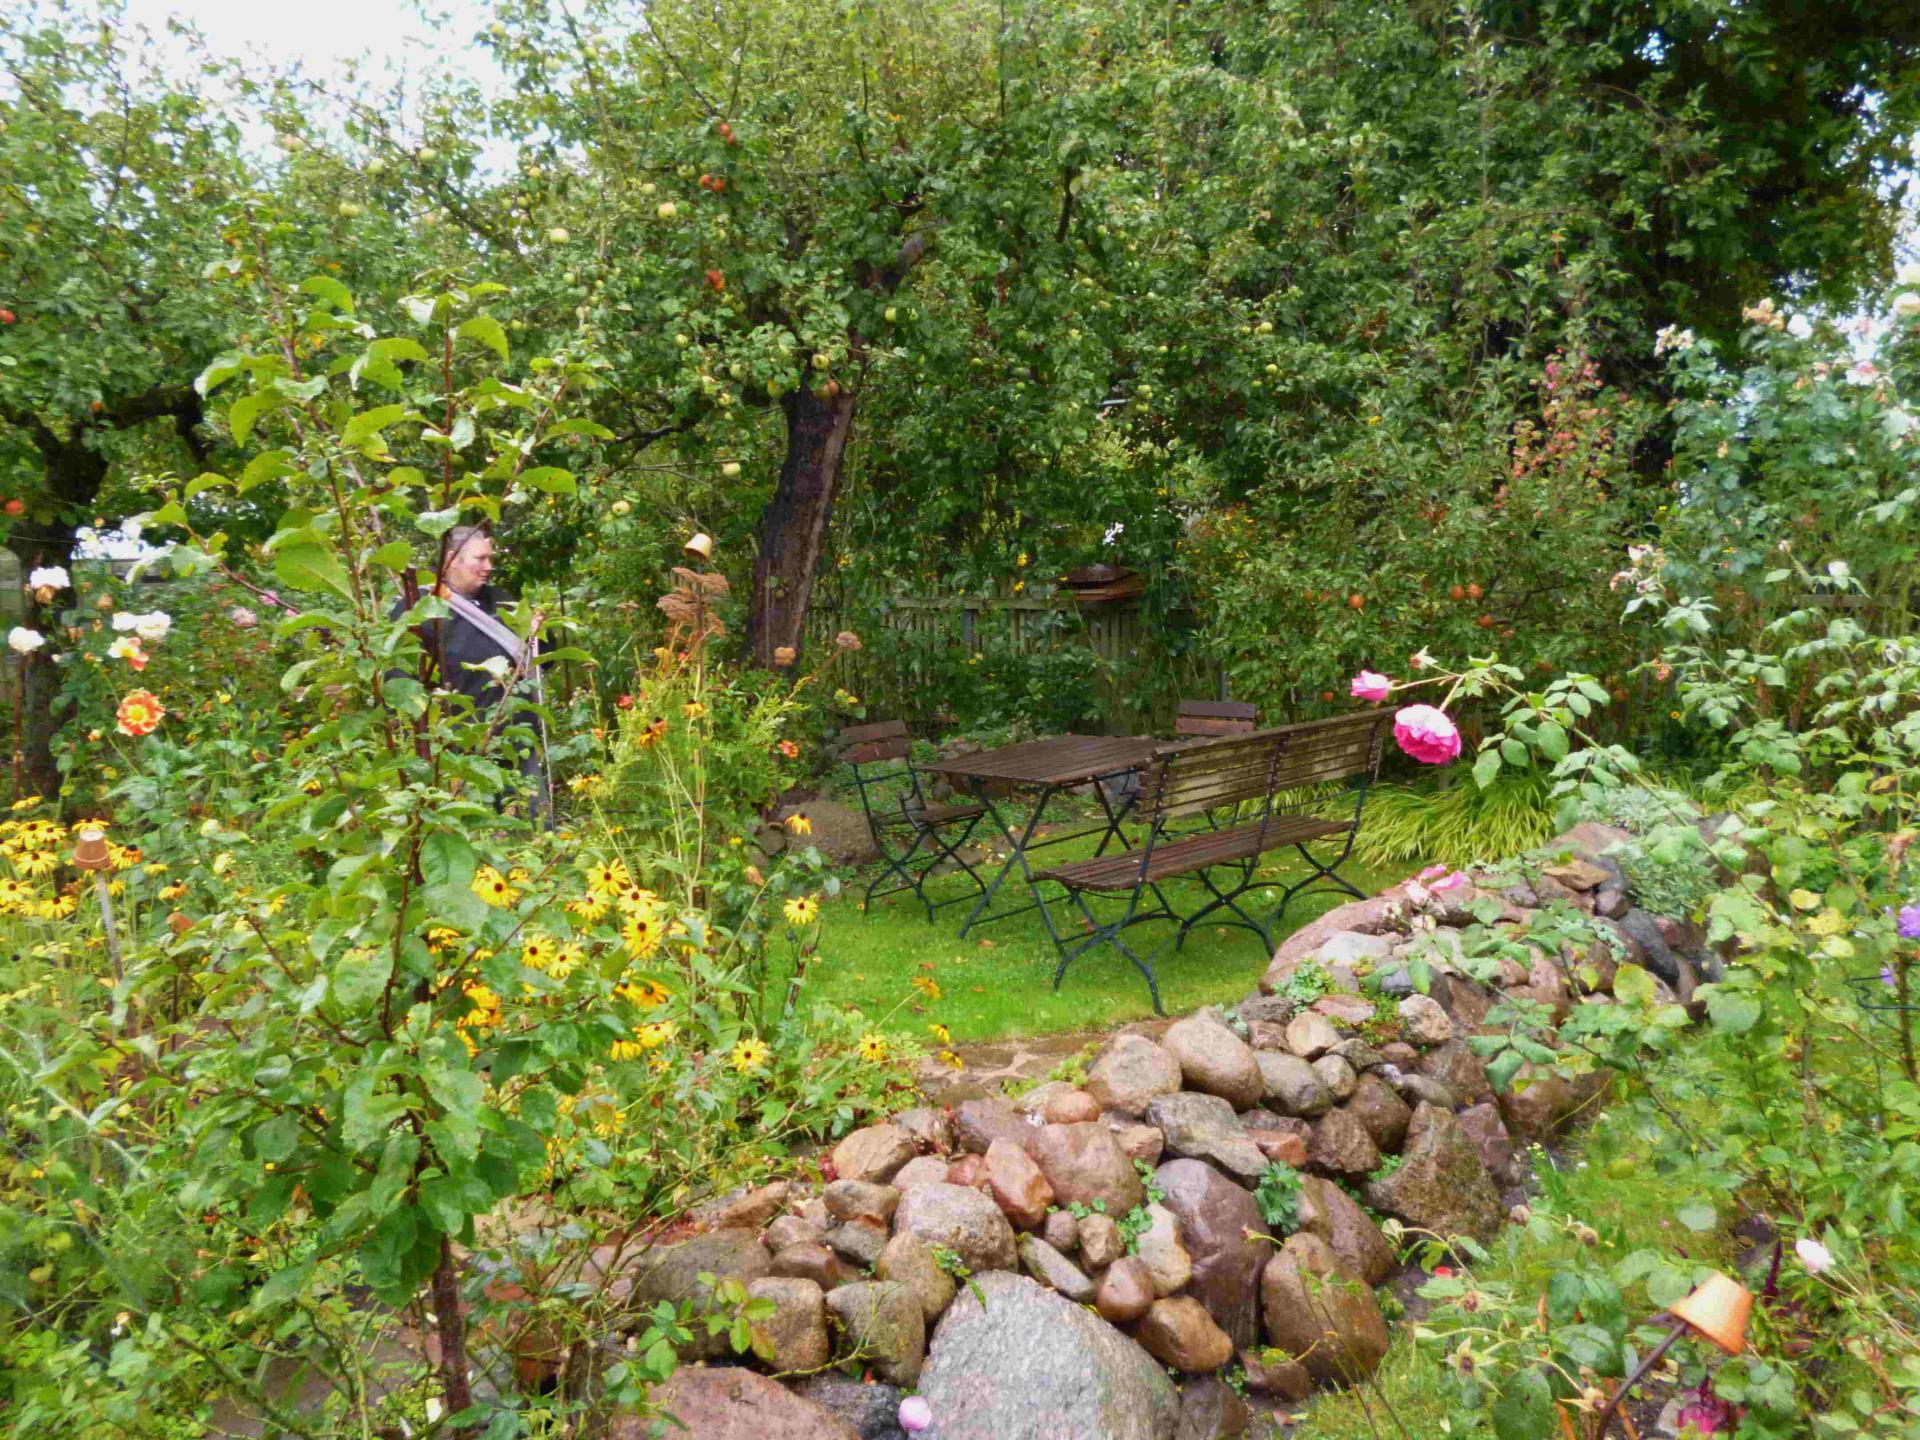 Offene Gartenpfporte 26-09-2020 Bild 05